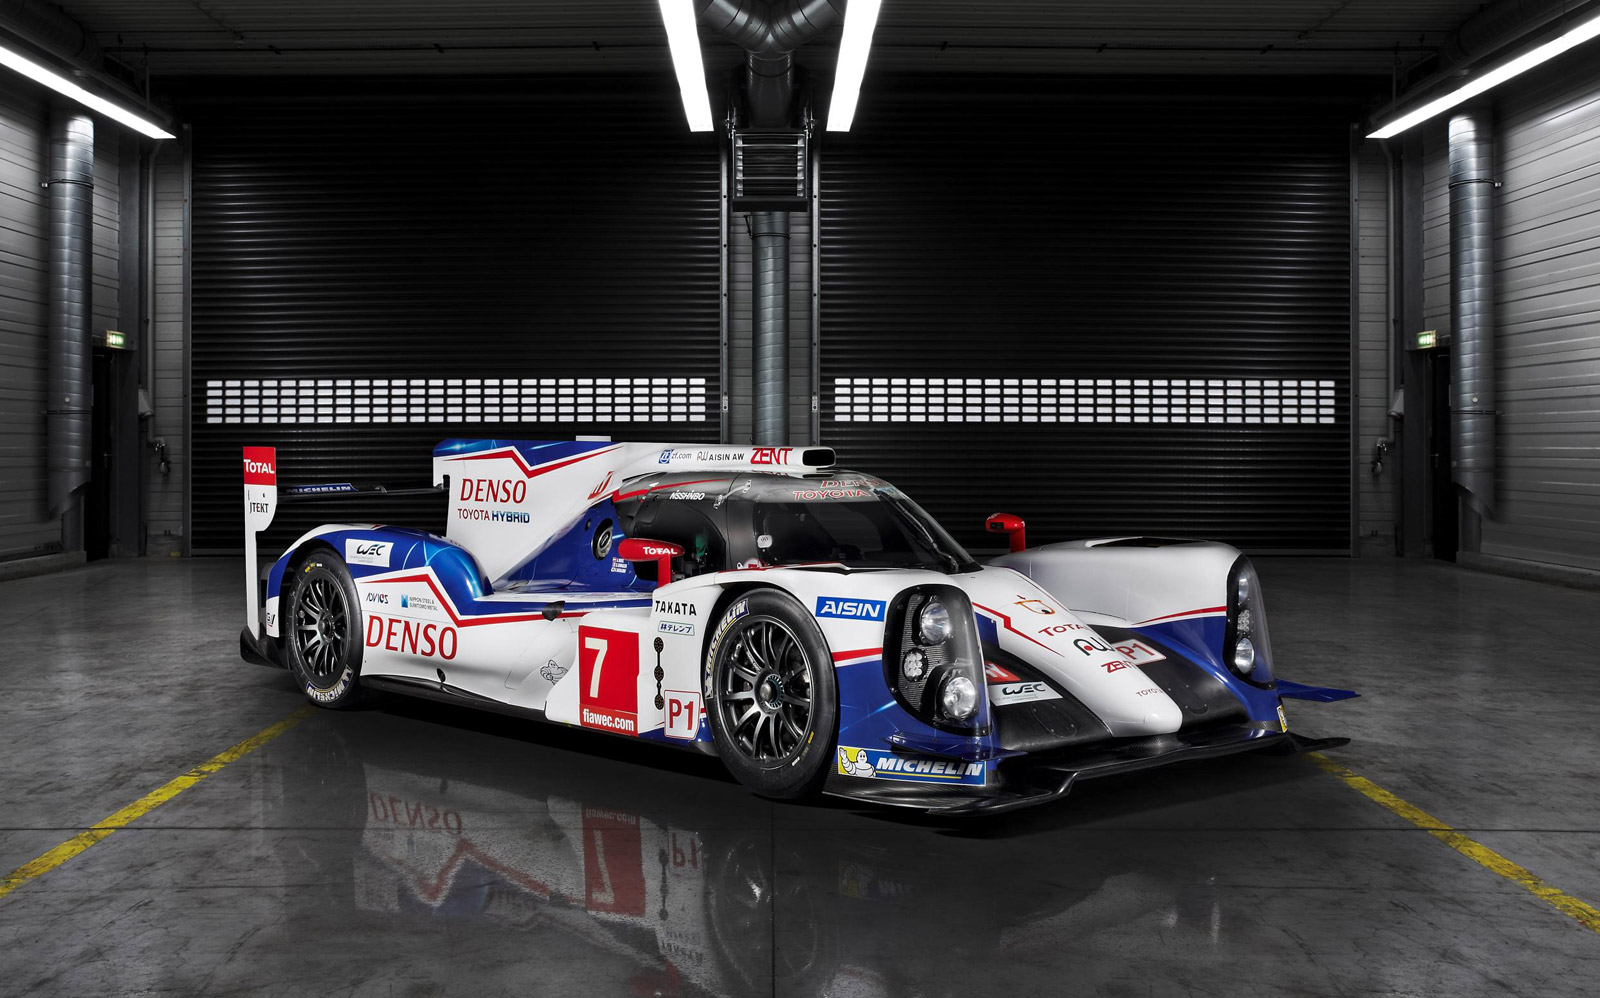 Bmw M8 Le Mans >> 2014 Toyota TS040 Hybrid Le Mans Prototype Revealed: Video